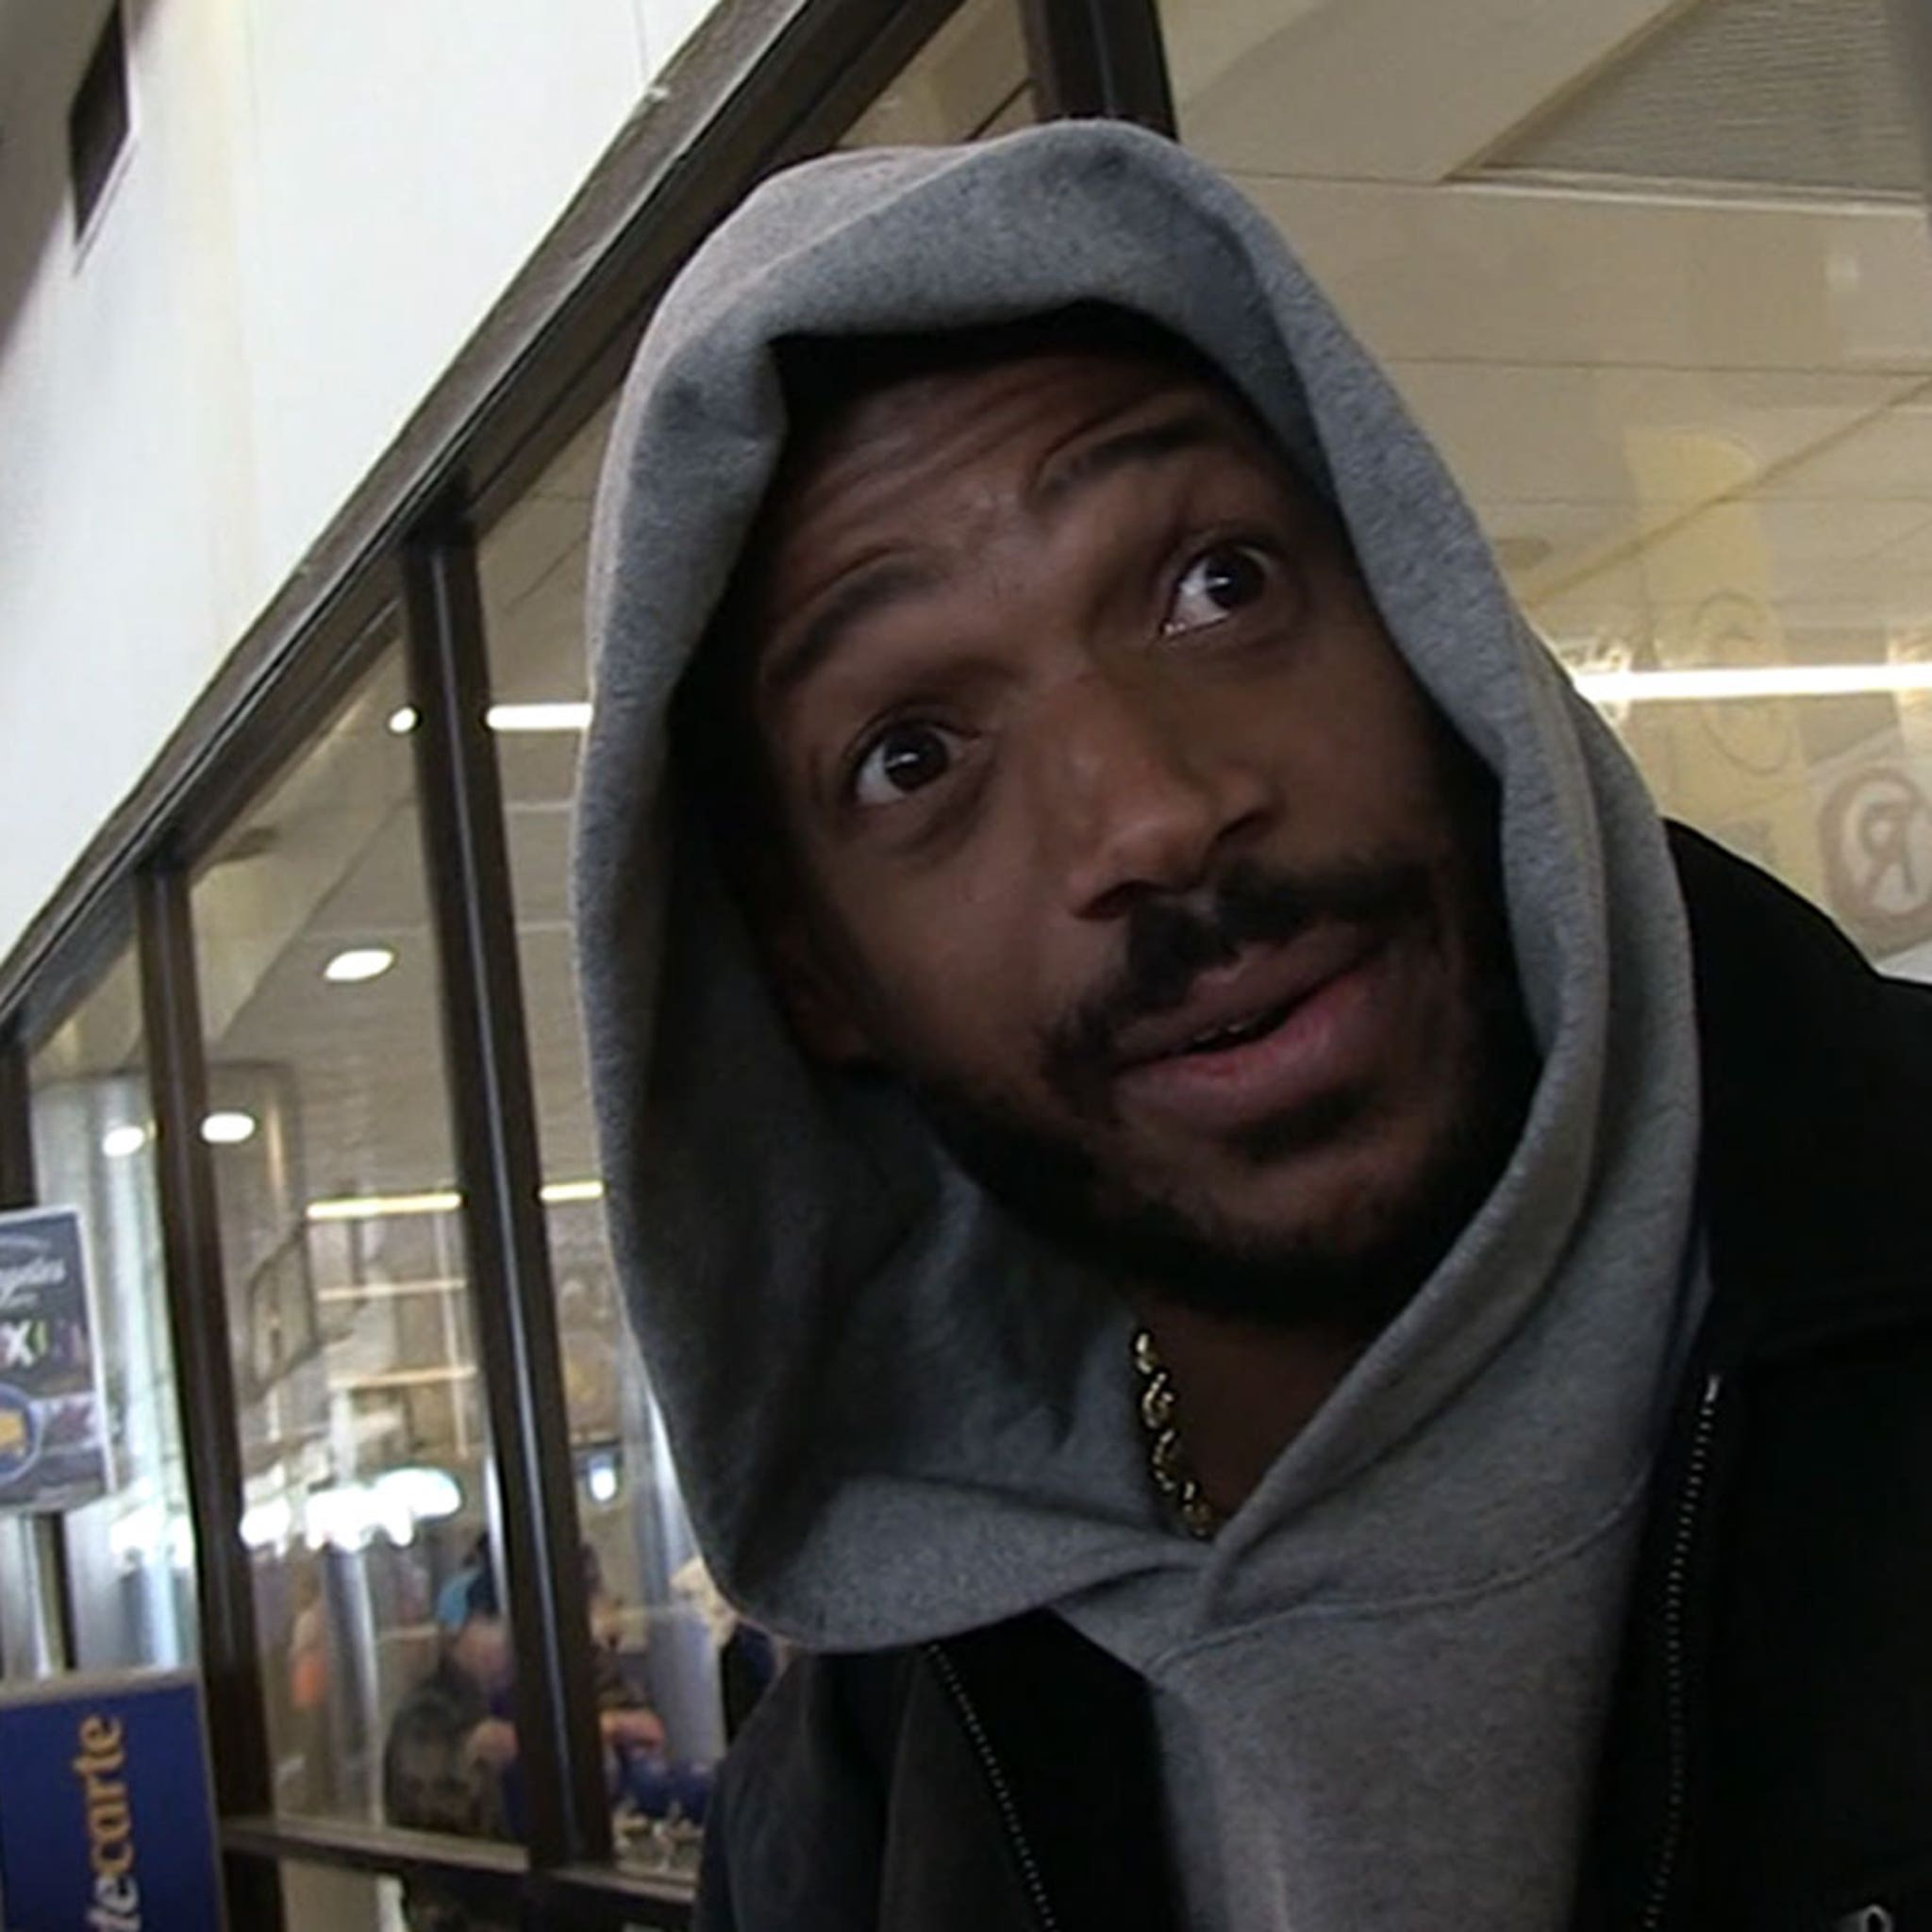 Marlon Wayans Condemns CA Court Decision to Reopen Cleveland Case